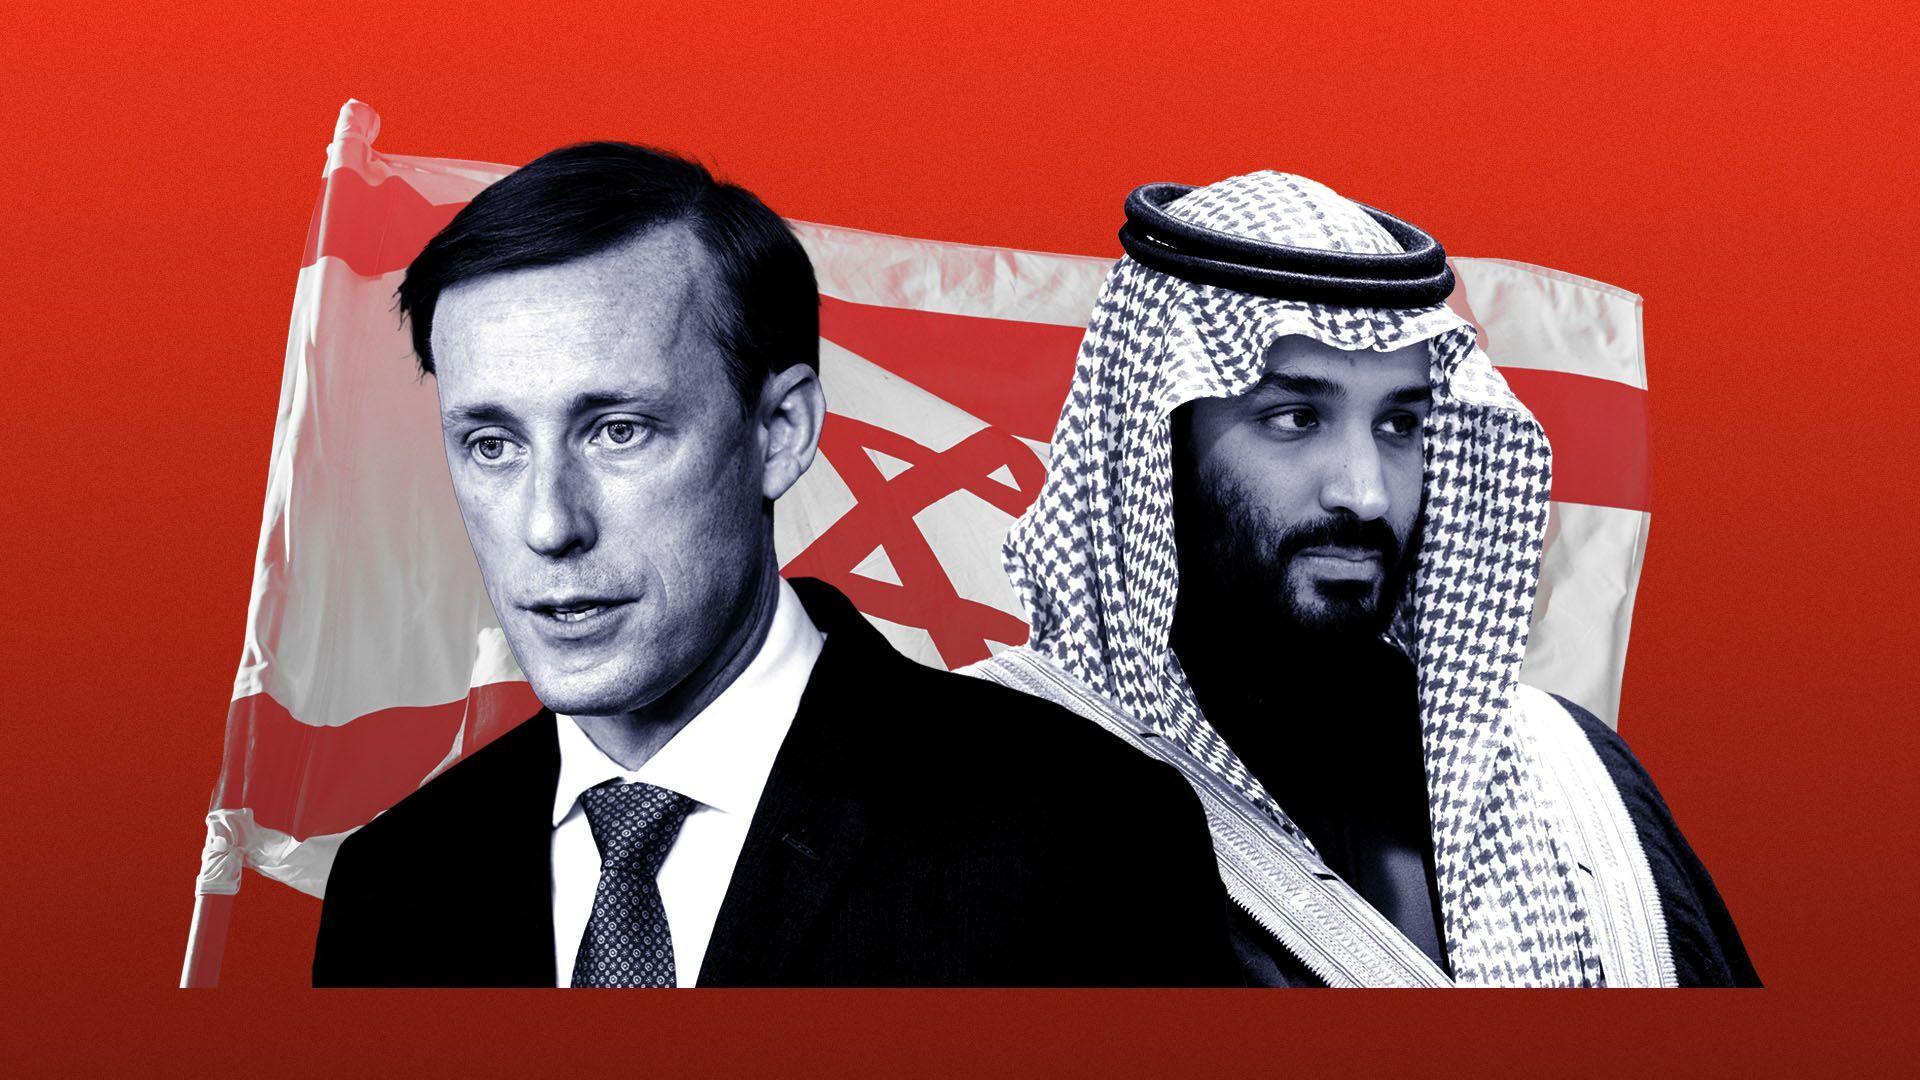 Photo illustration of Jake Sullivan and Prince Mohammed bin Salman Al Saud with an Israeli flag behind them